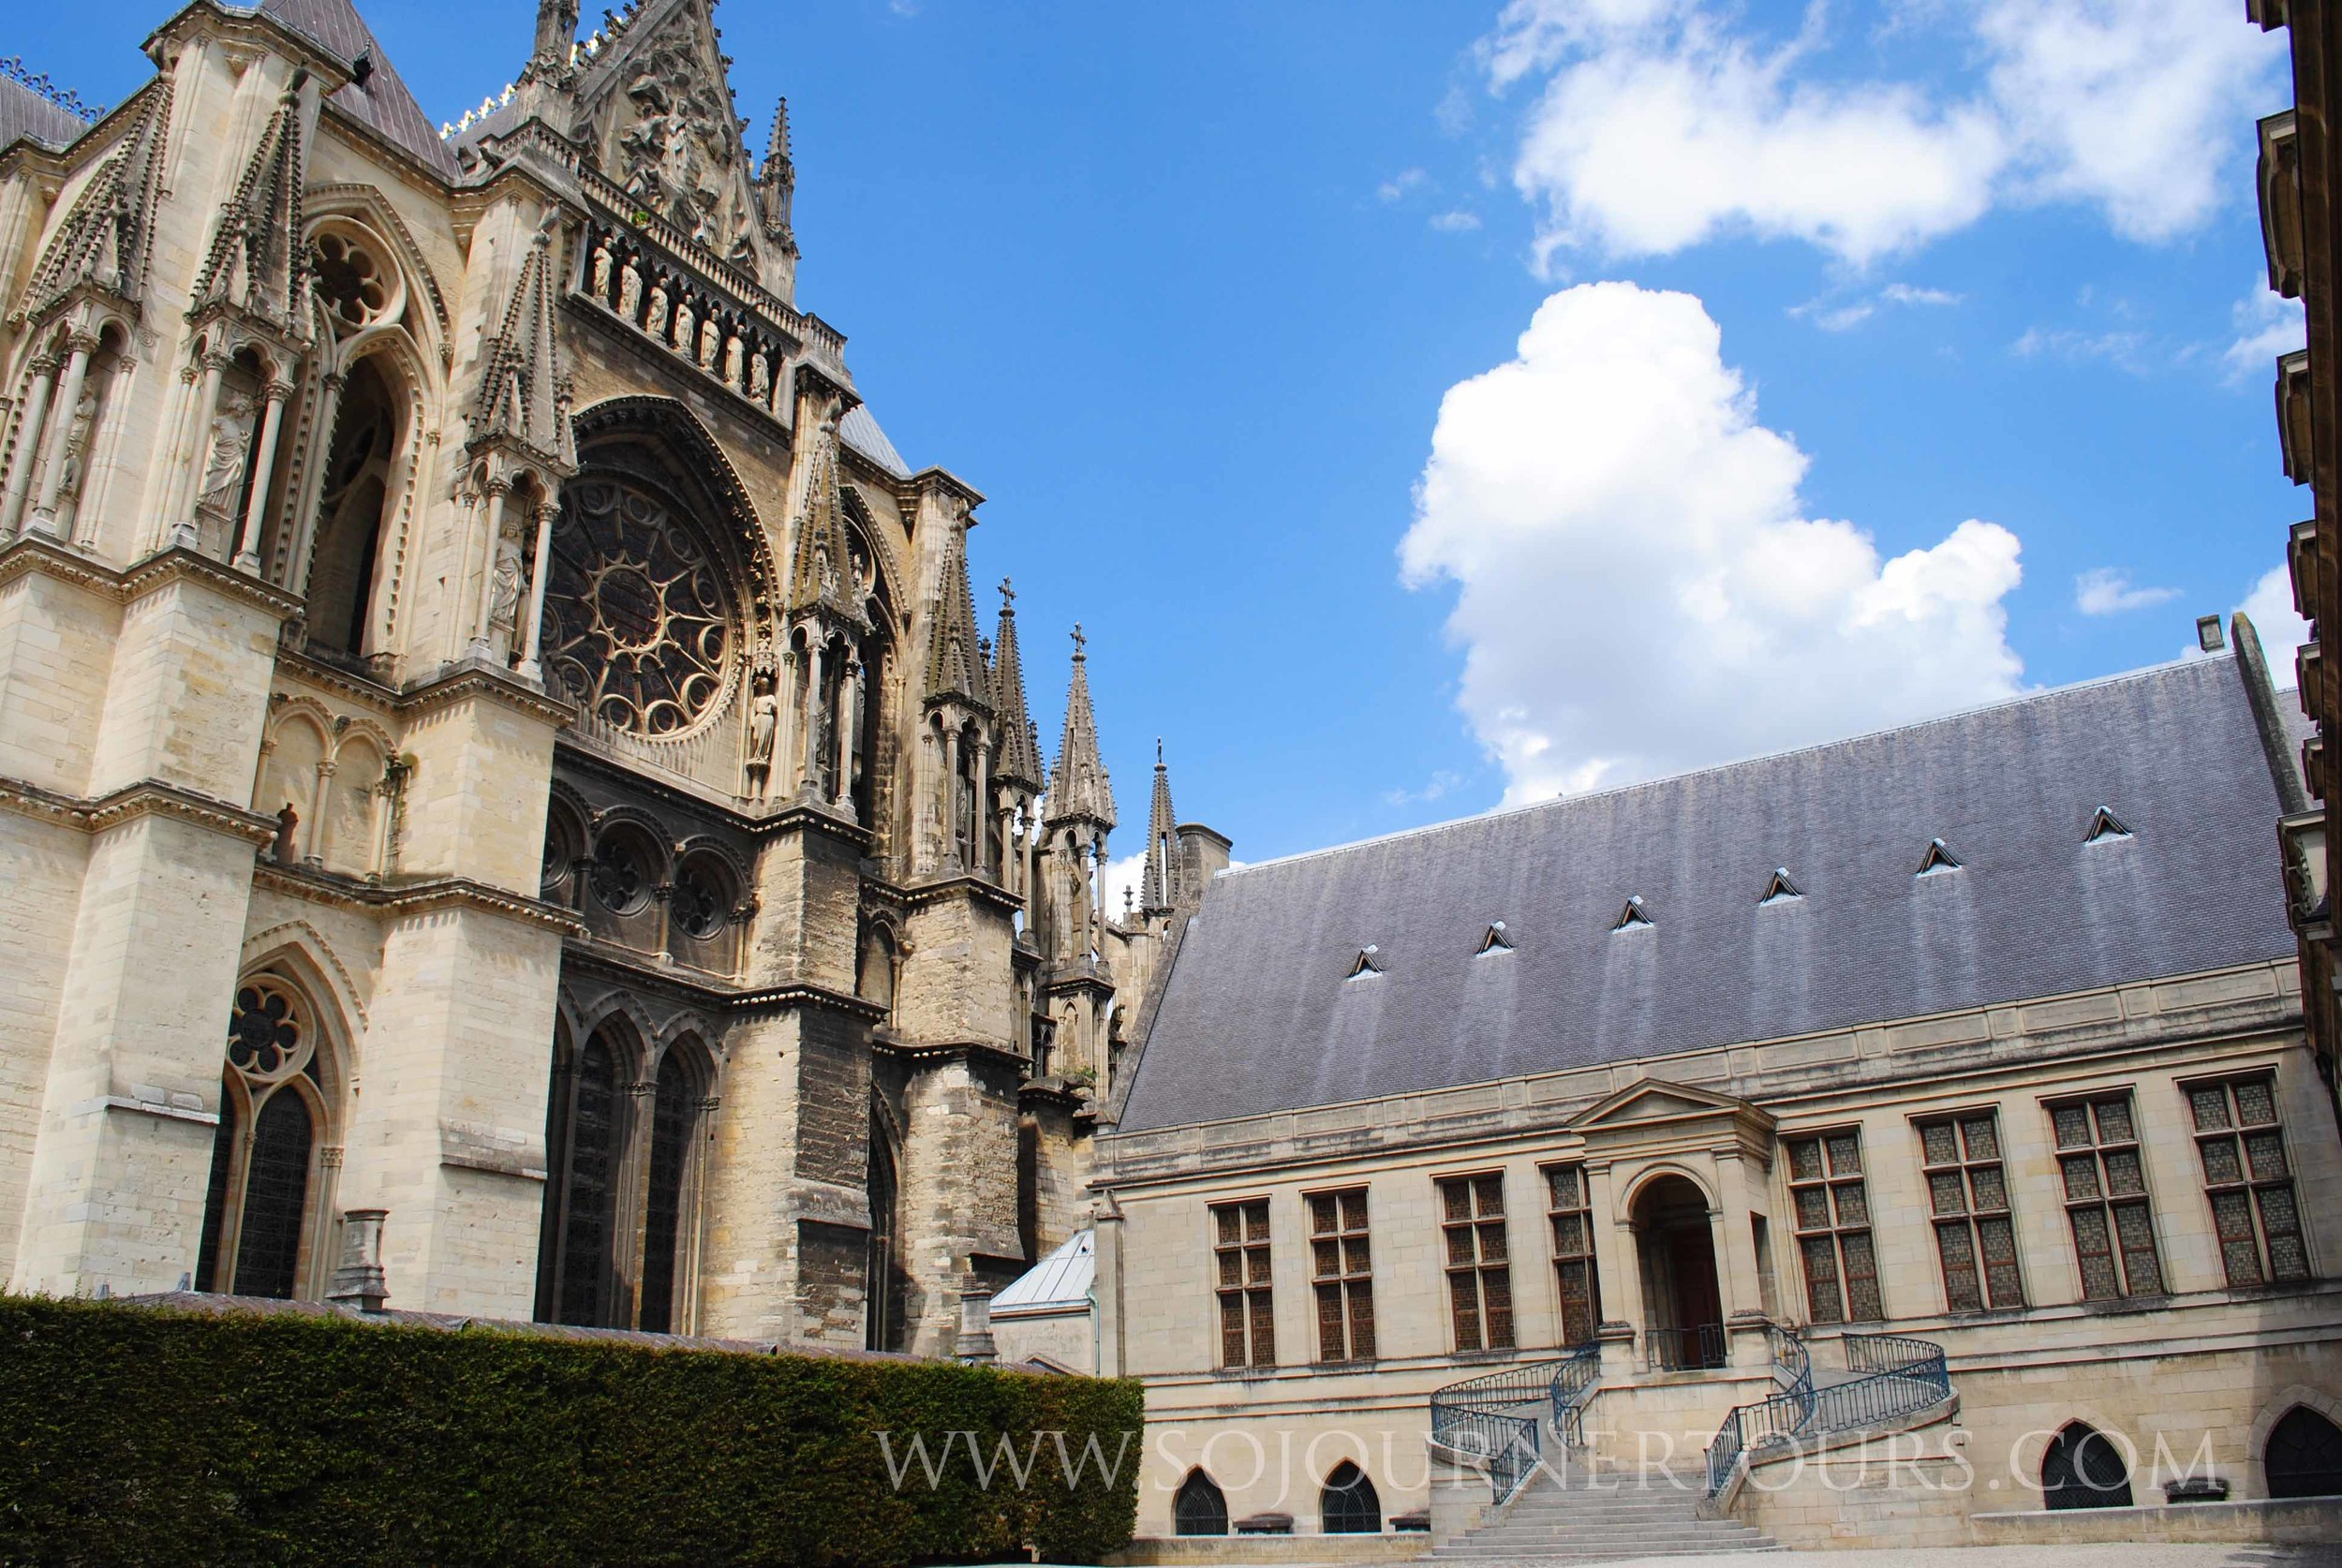 Notre Dame de Reims: Reims, France (Sojourner Tours